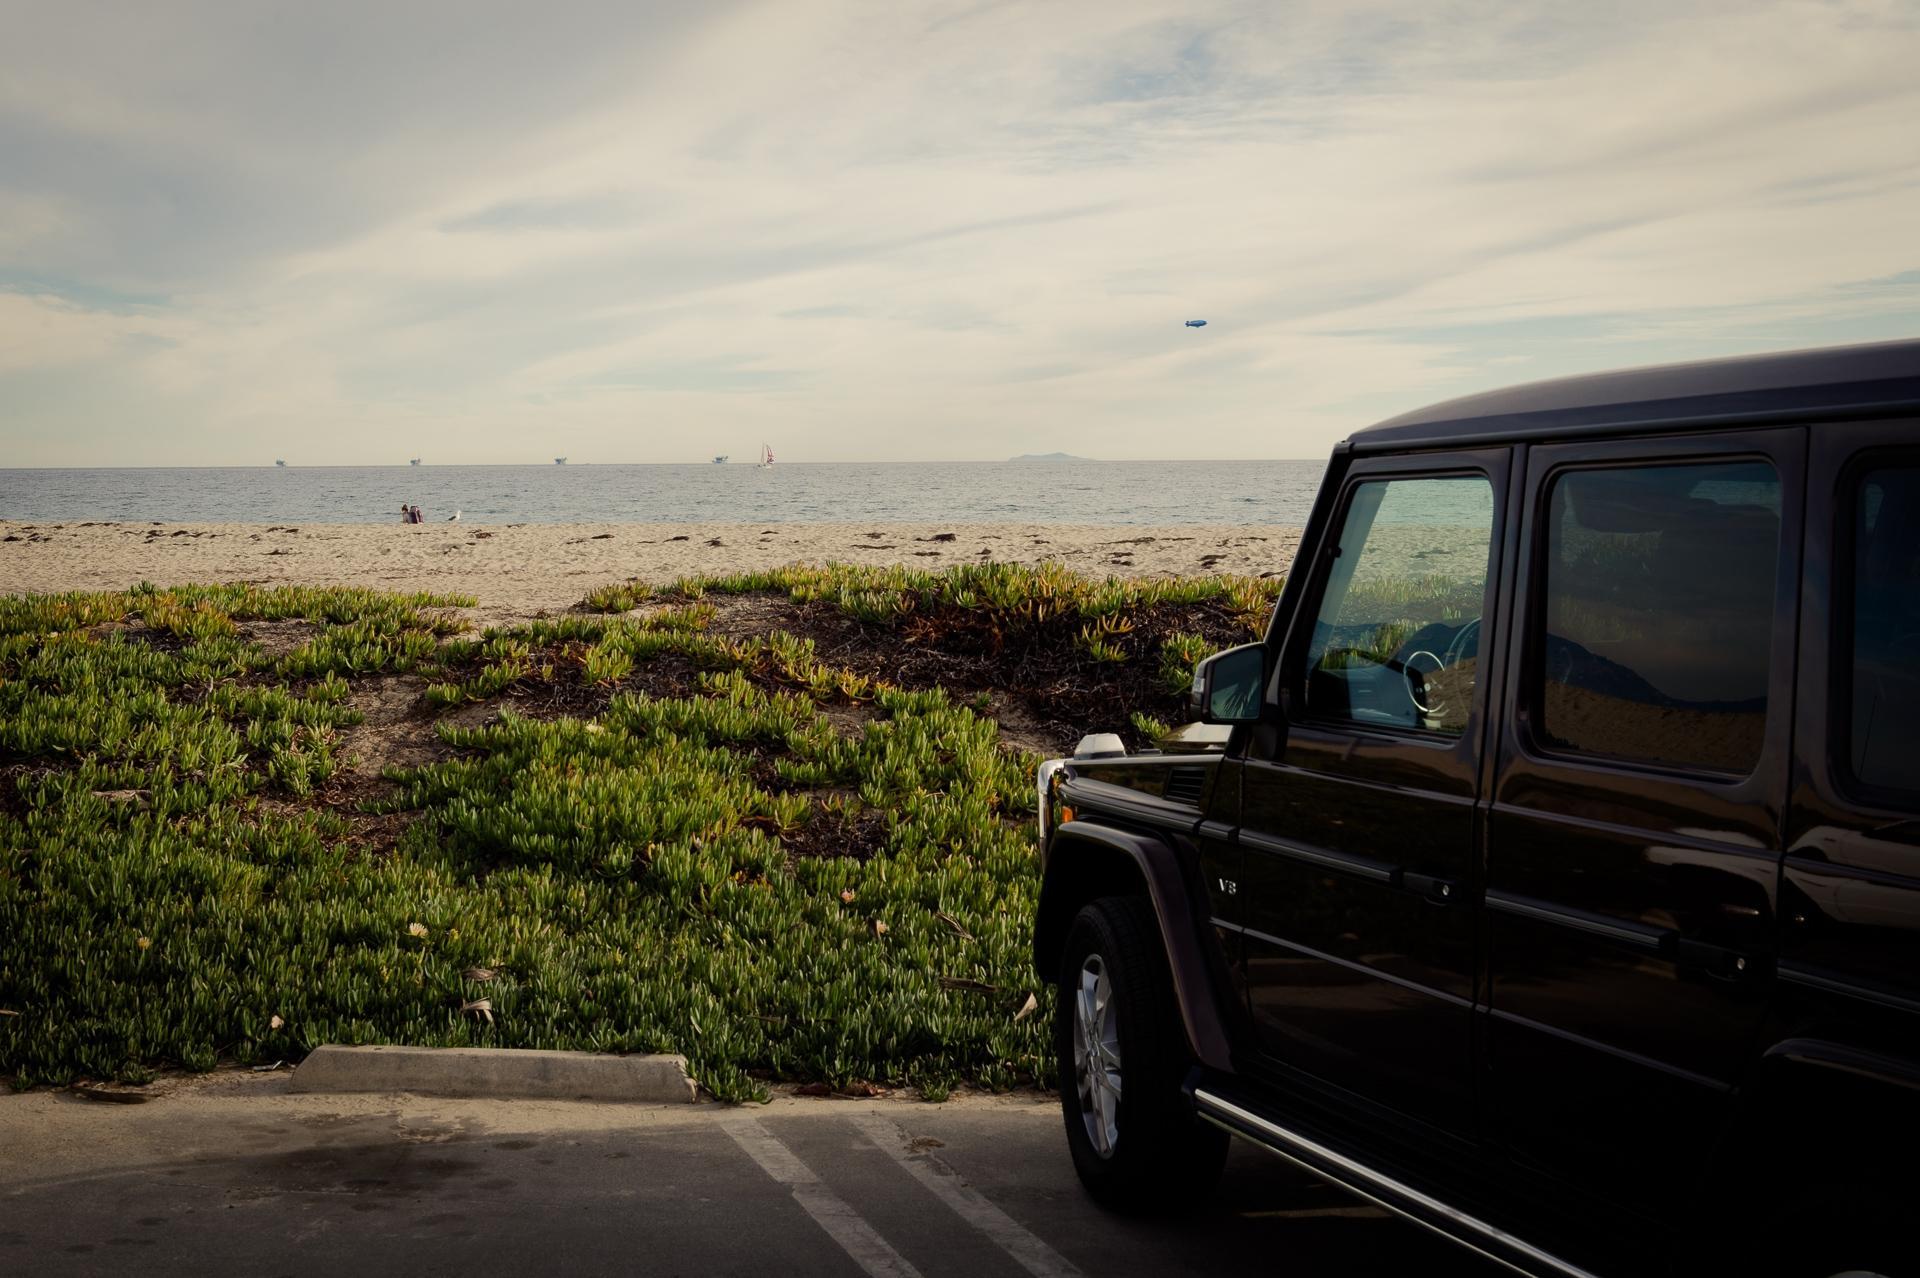 2014-Mercedes-Benz-G500-G550-braun-Kalifornien-mbrt14-22